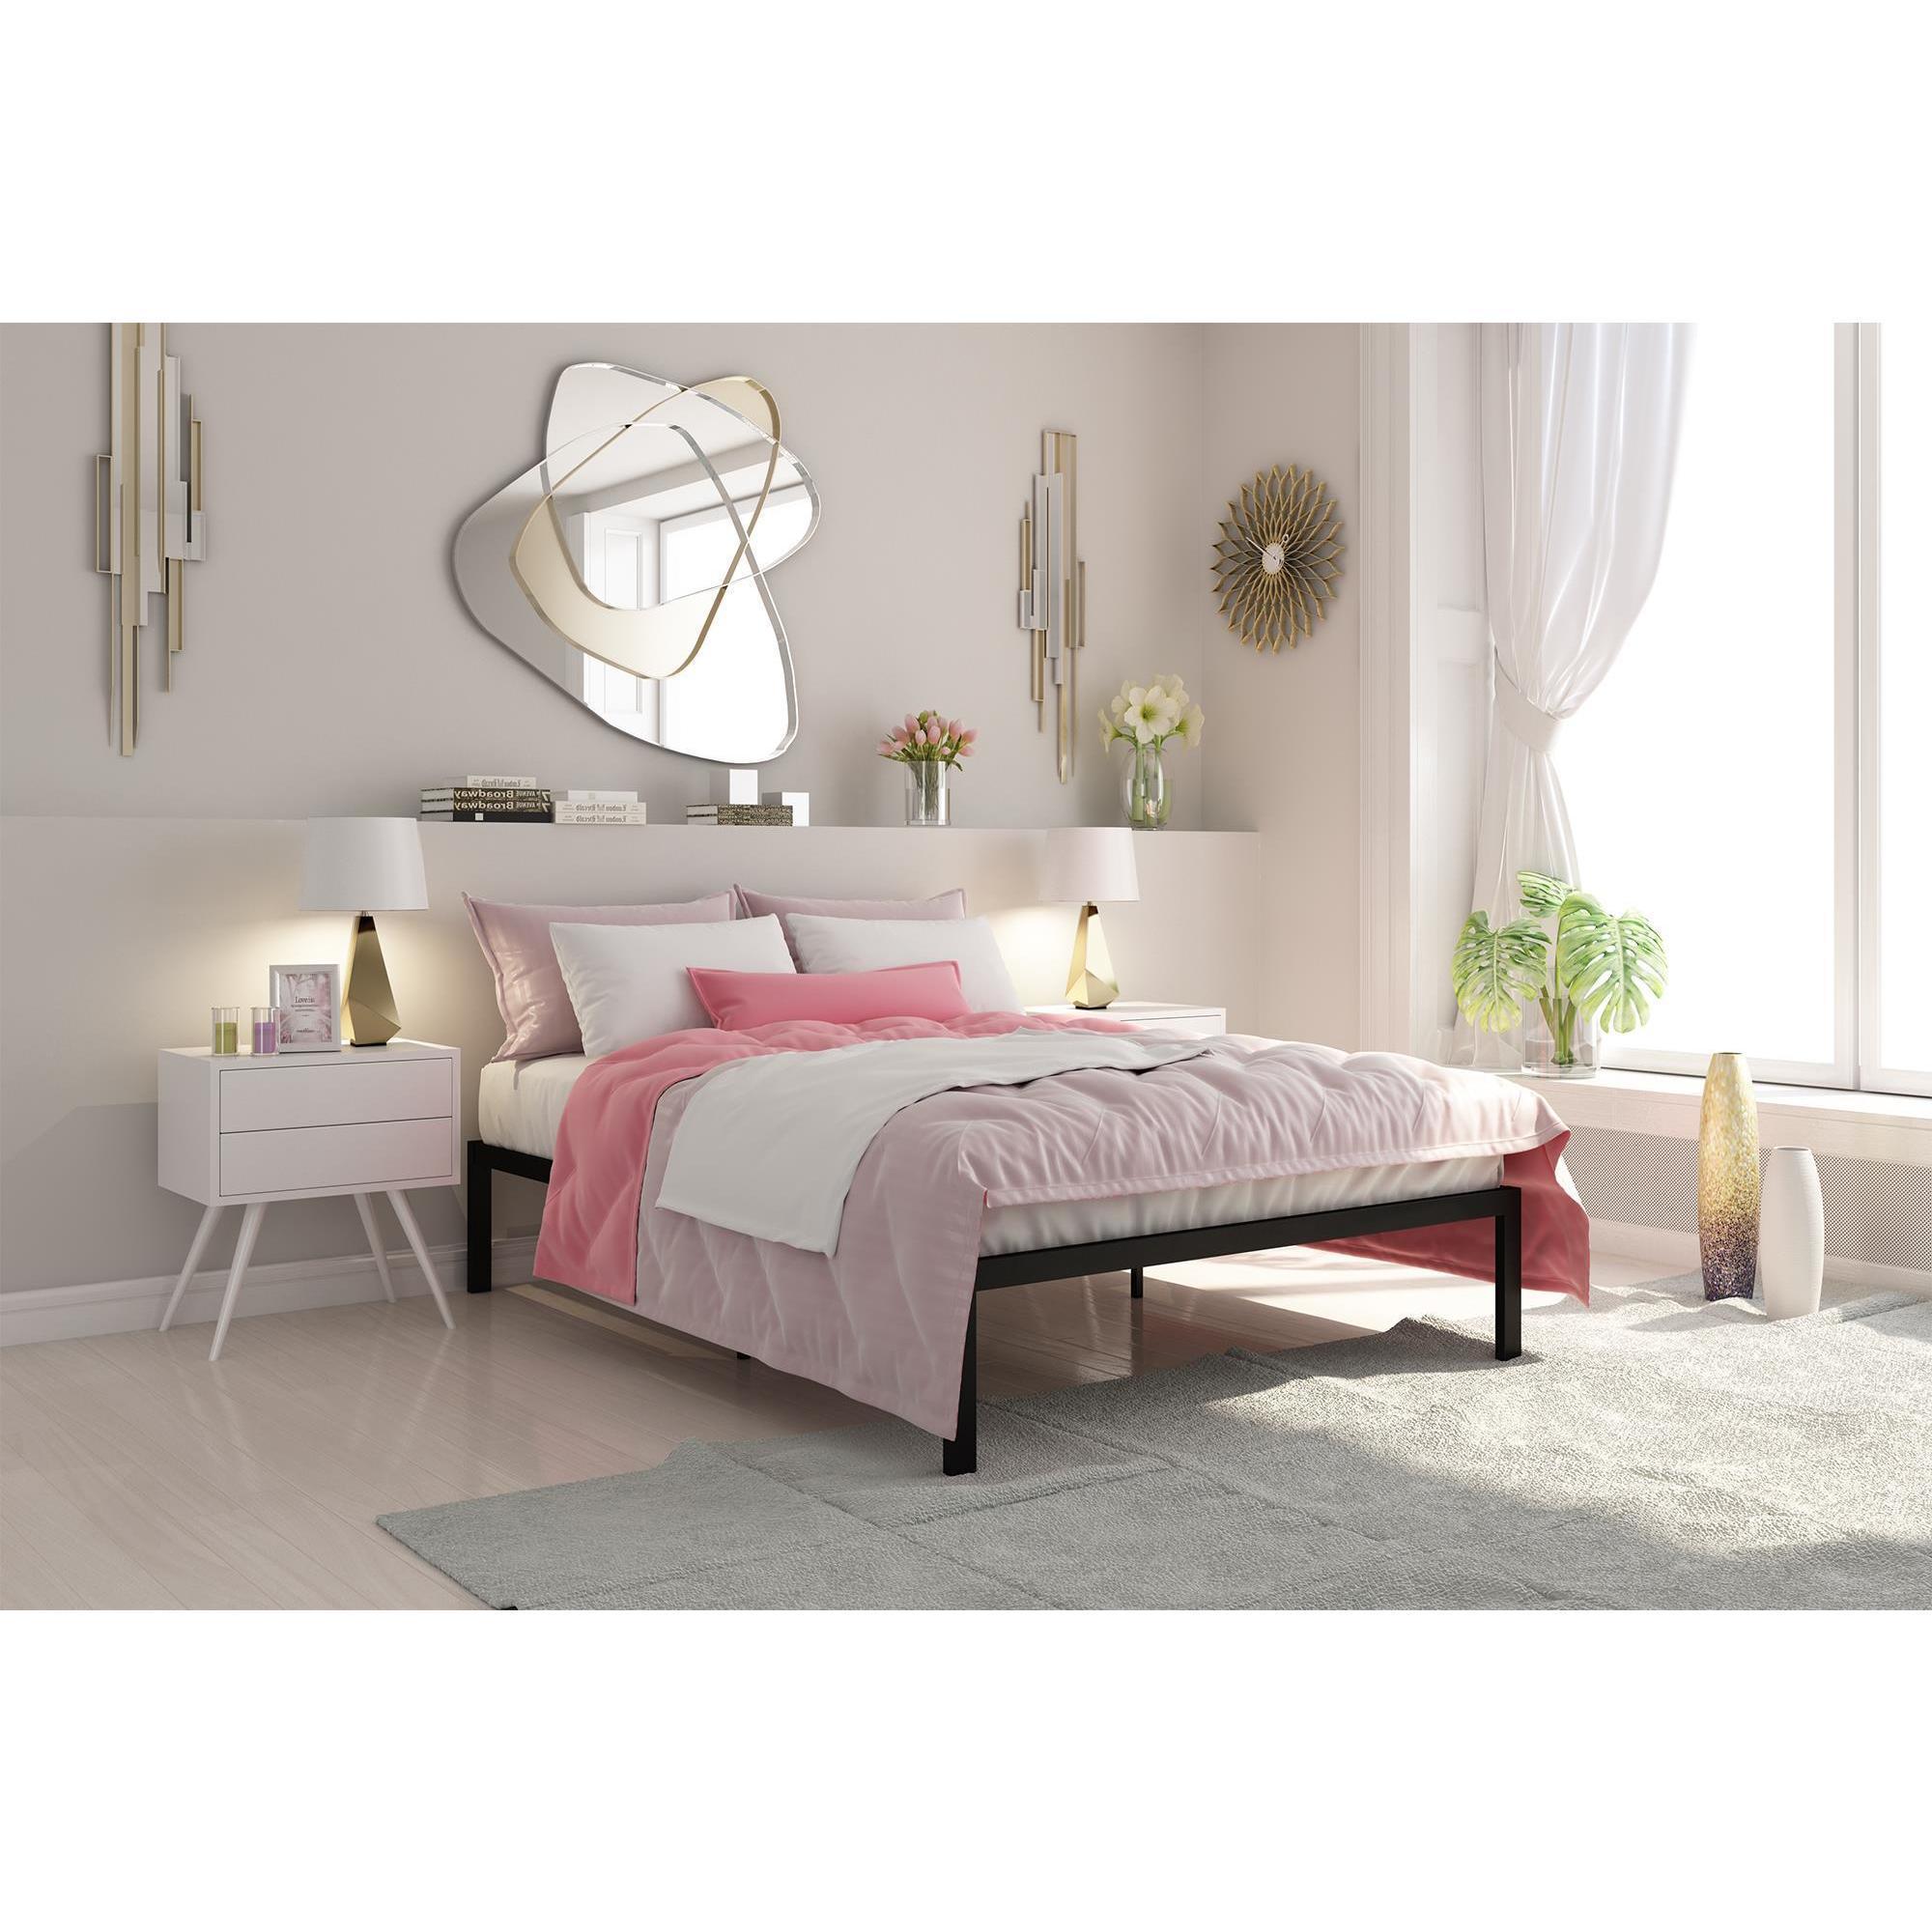 Signature Sleep Premium Modern Full Platform Bed - Free Shipping On ...